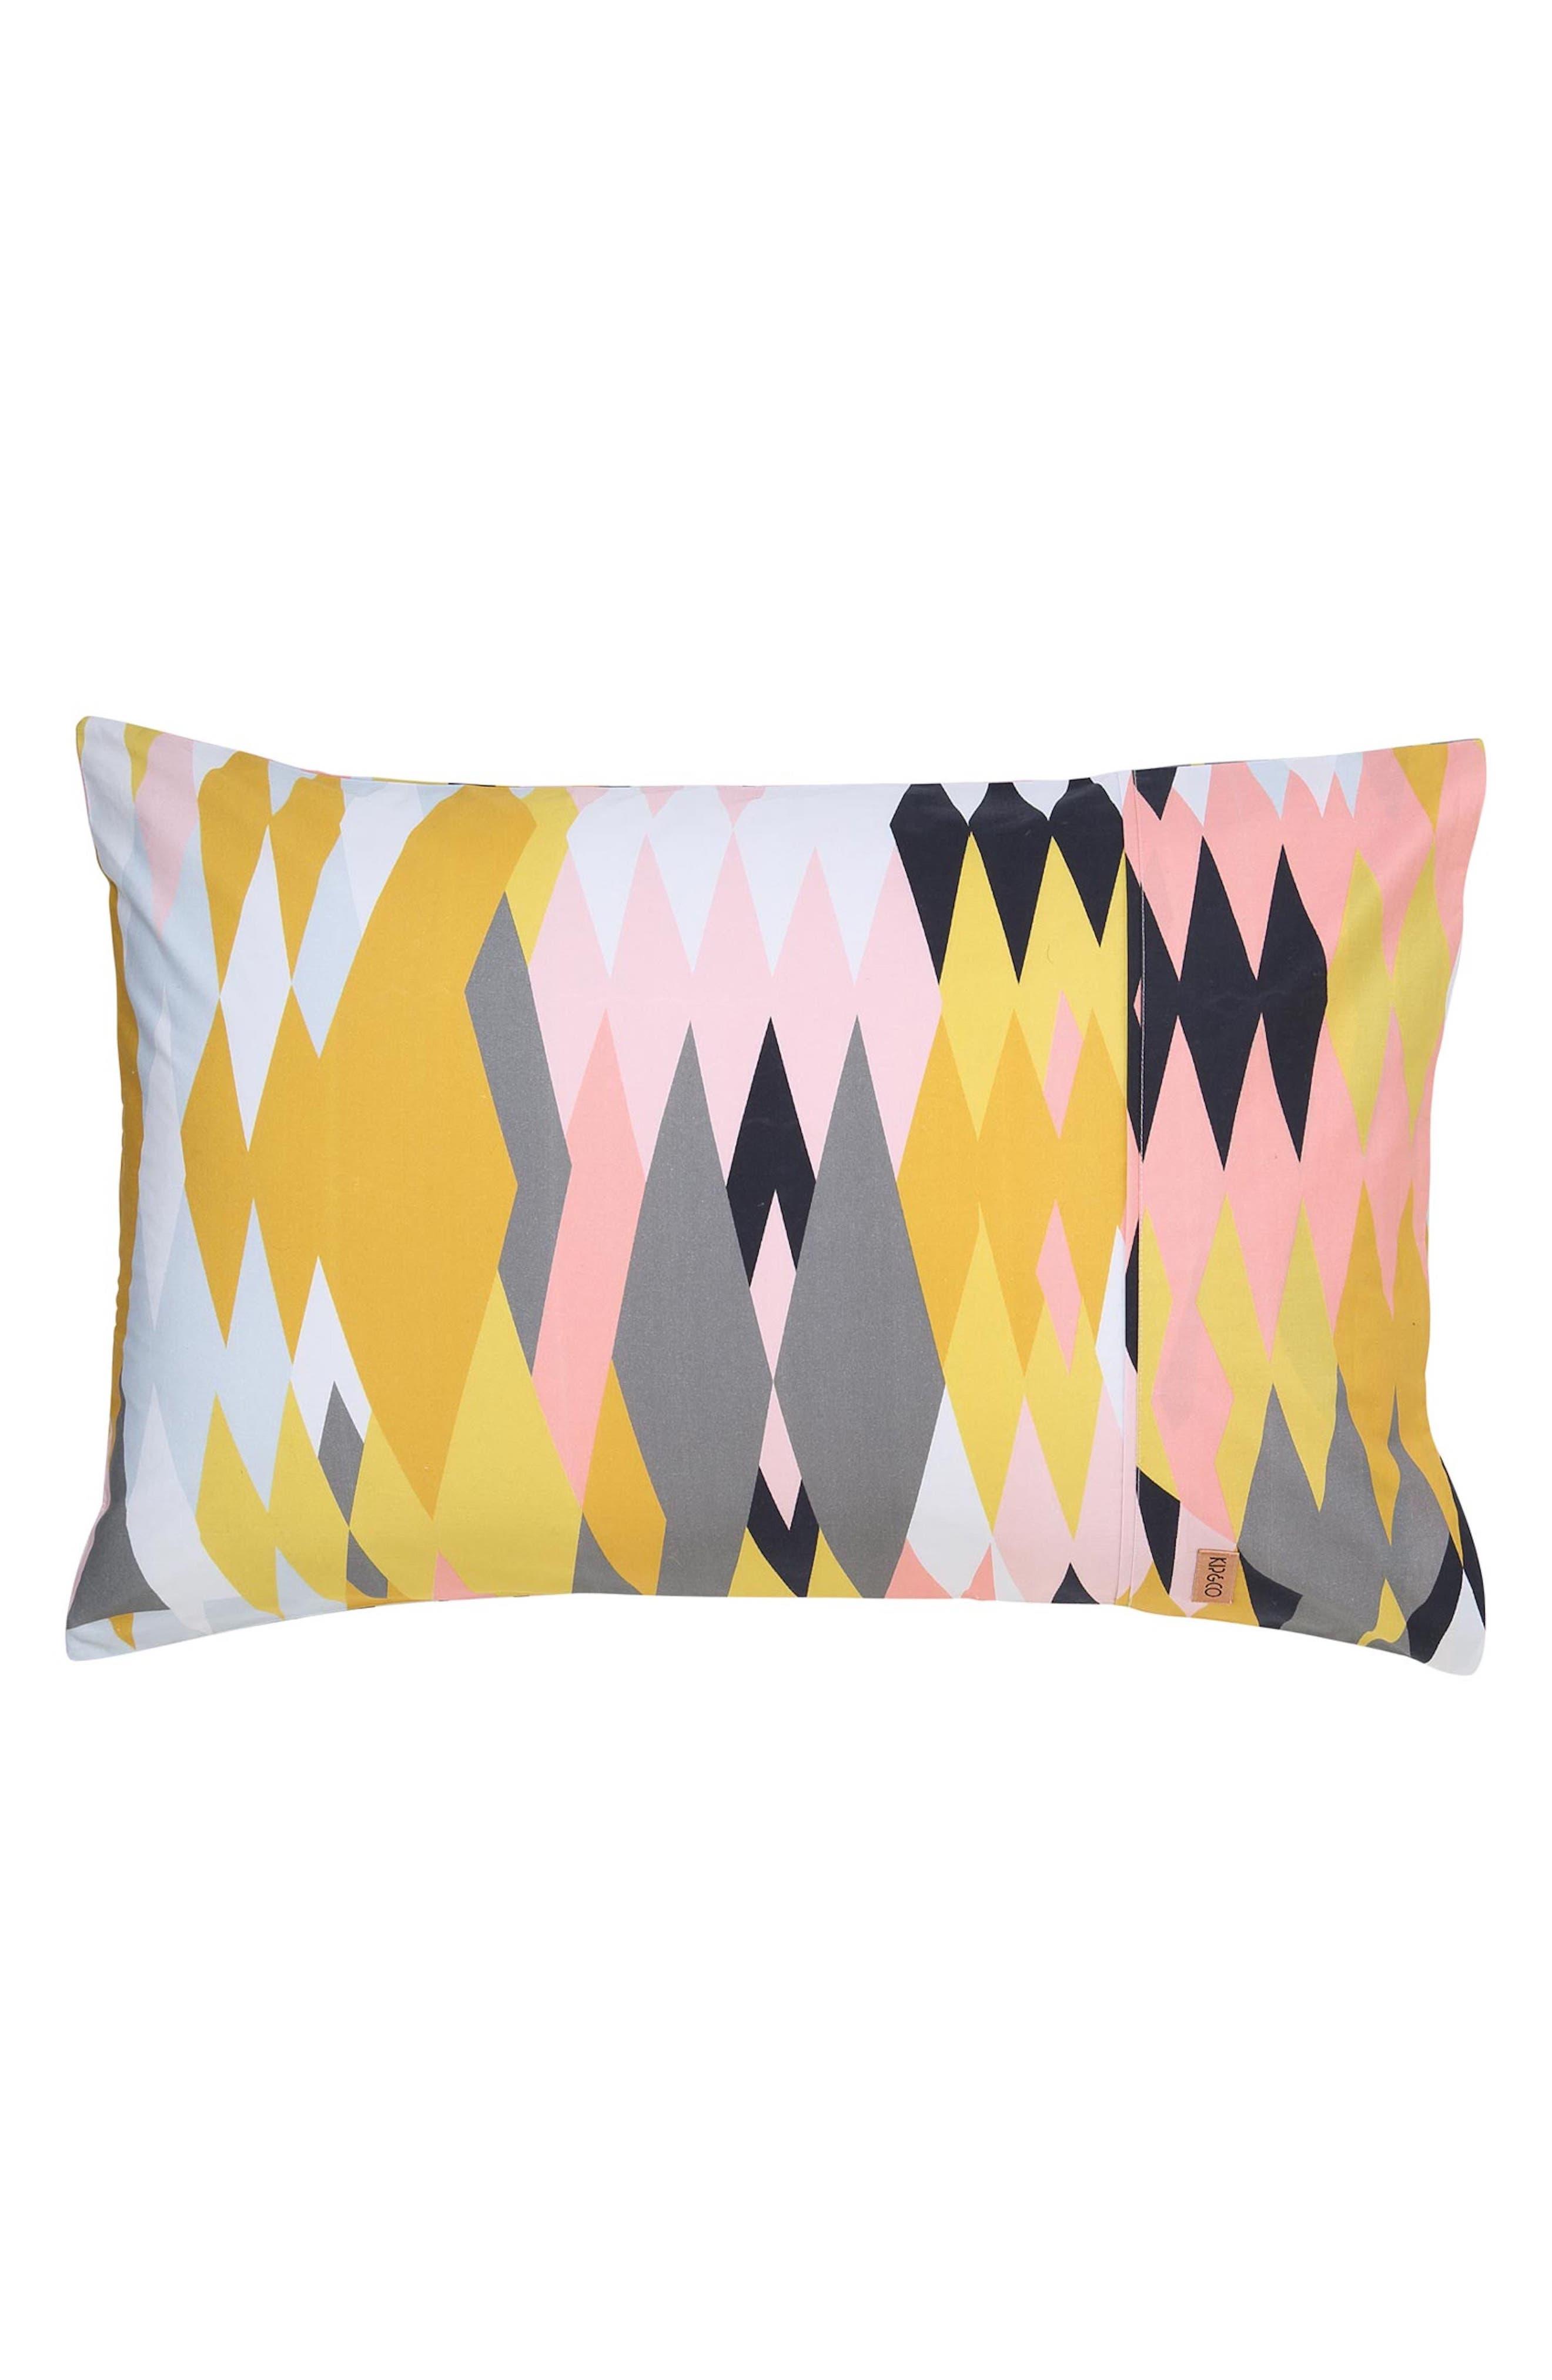 Croc Desert Cotton Pillowcase,                             Main thumbnail 1, color,                             Multi